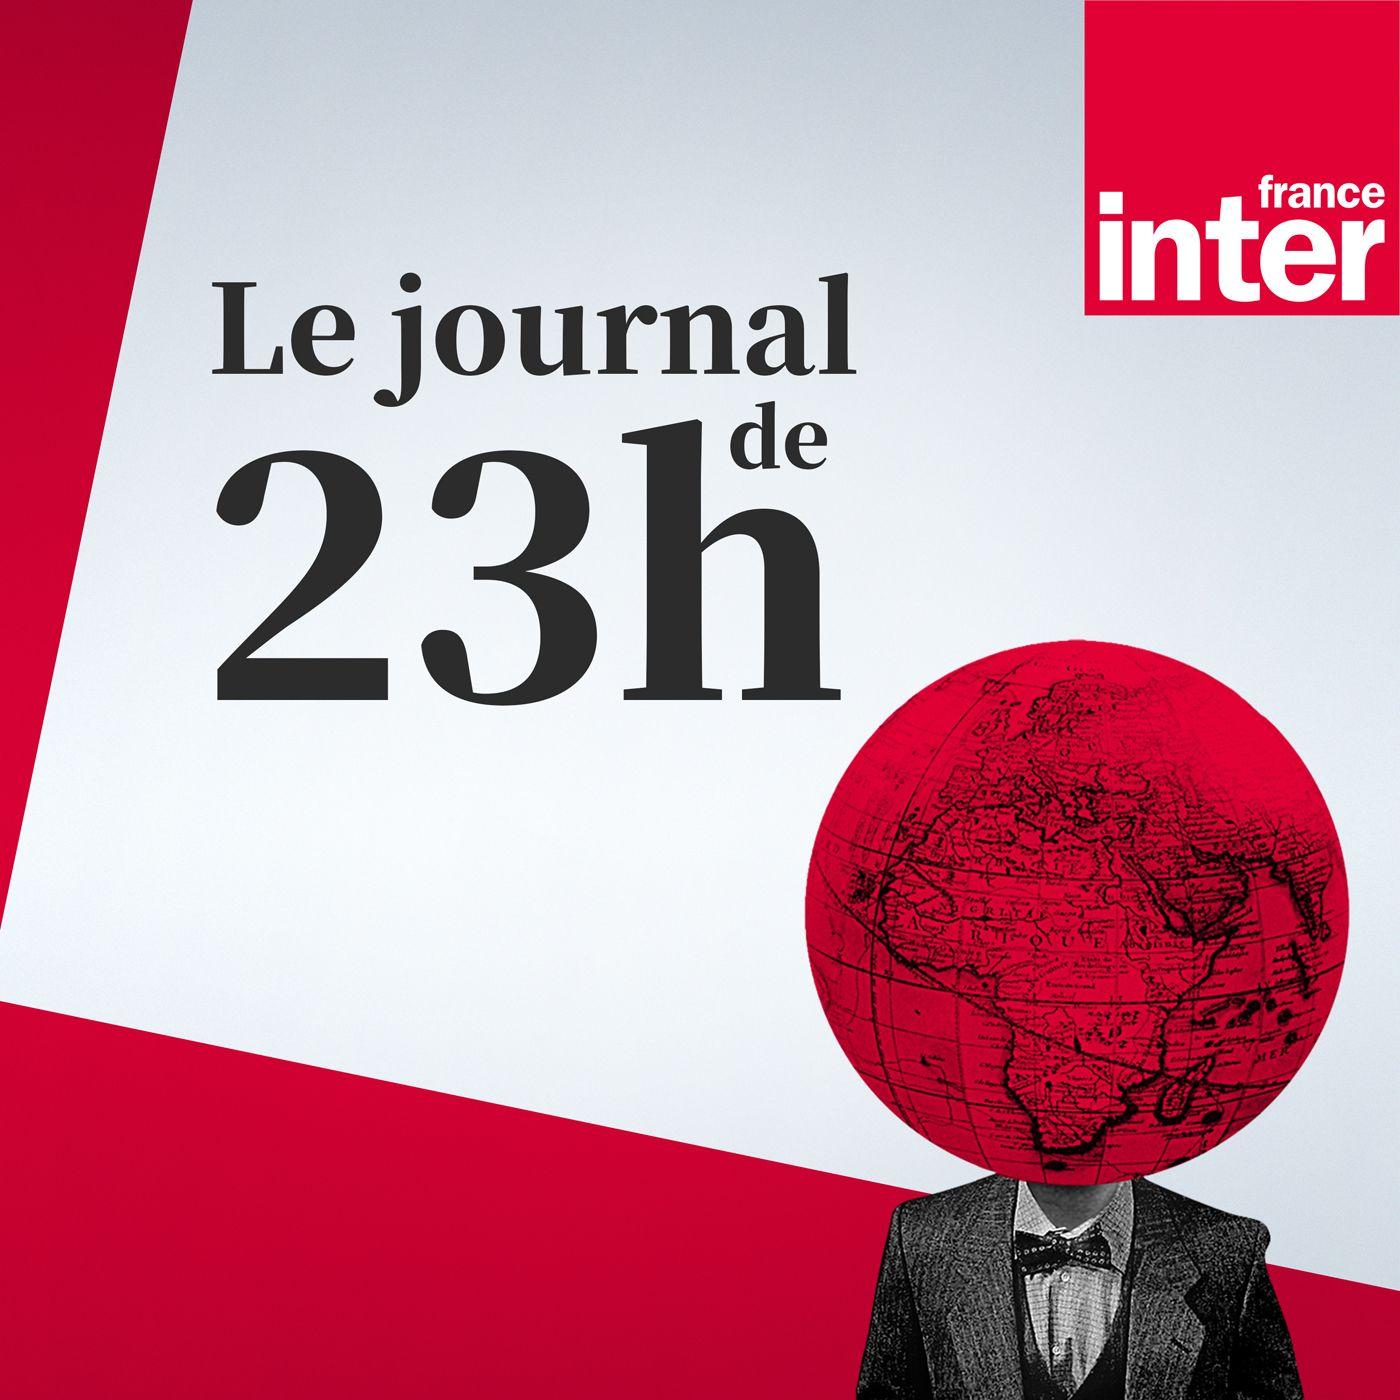 Image 1: Journal de 23h